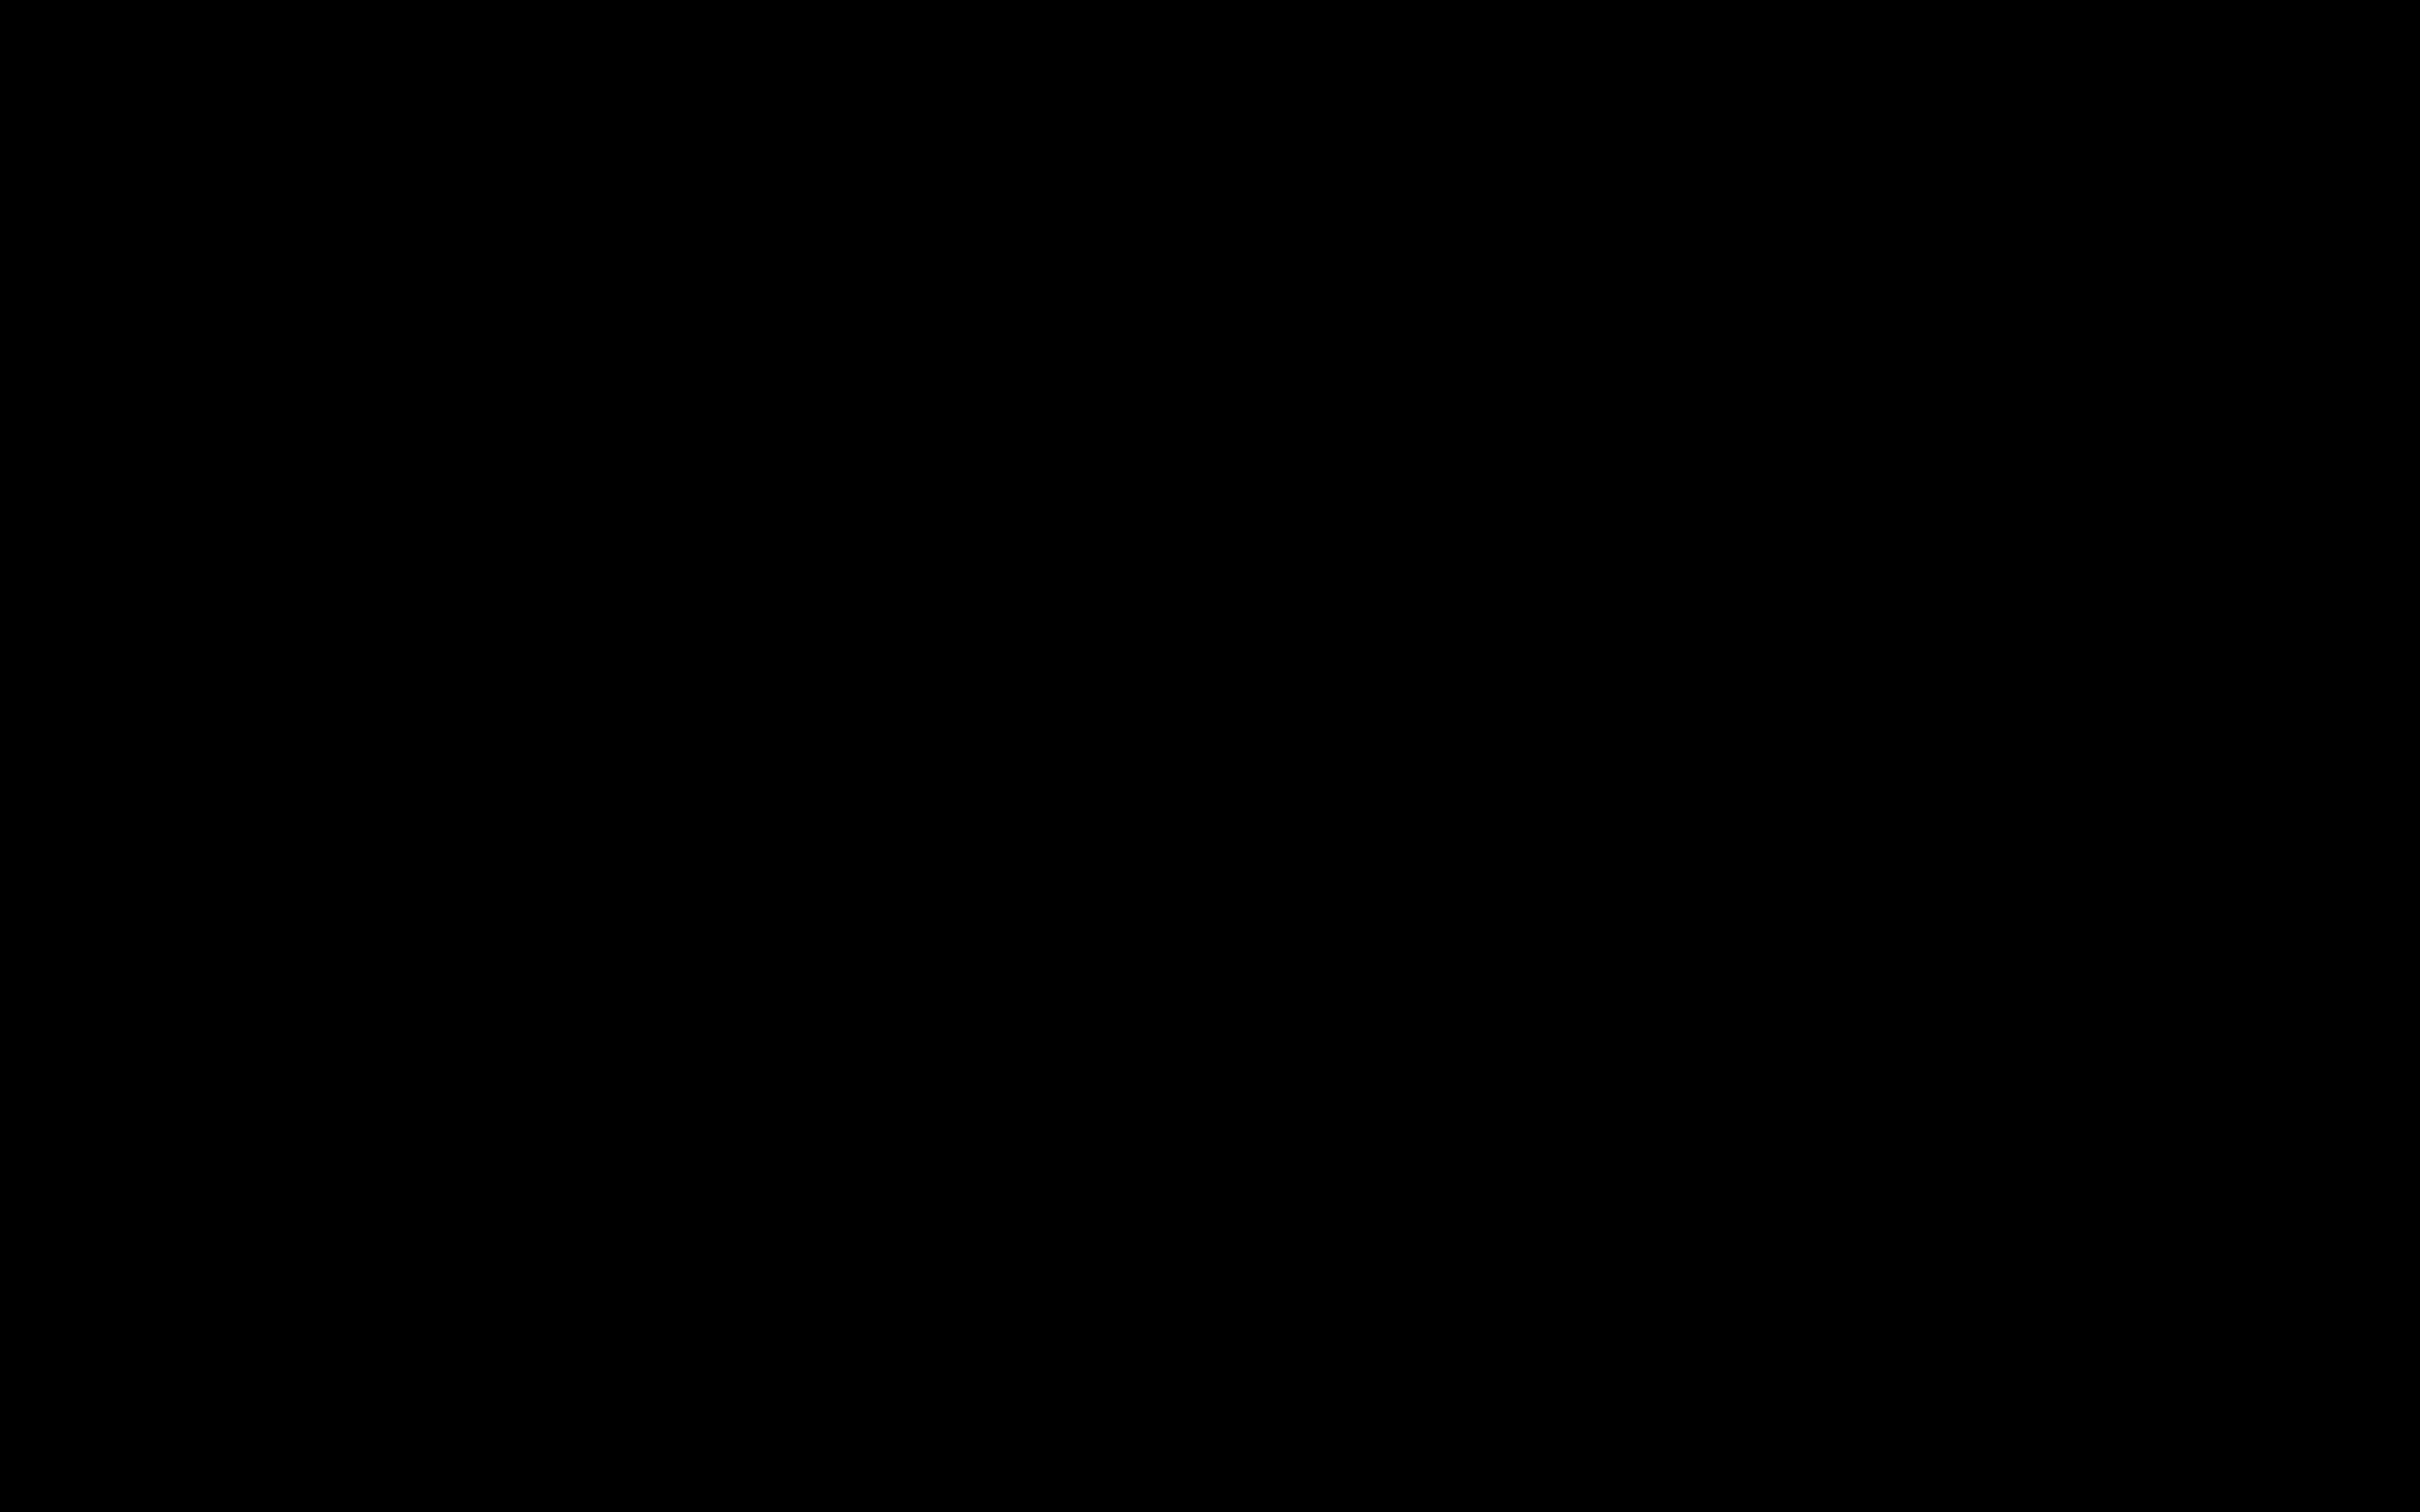 fond noir 4k